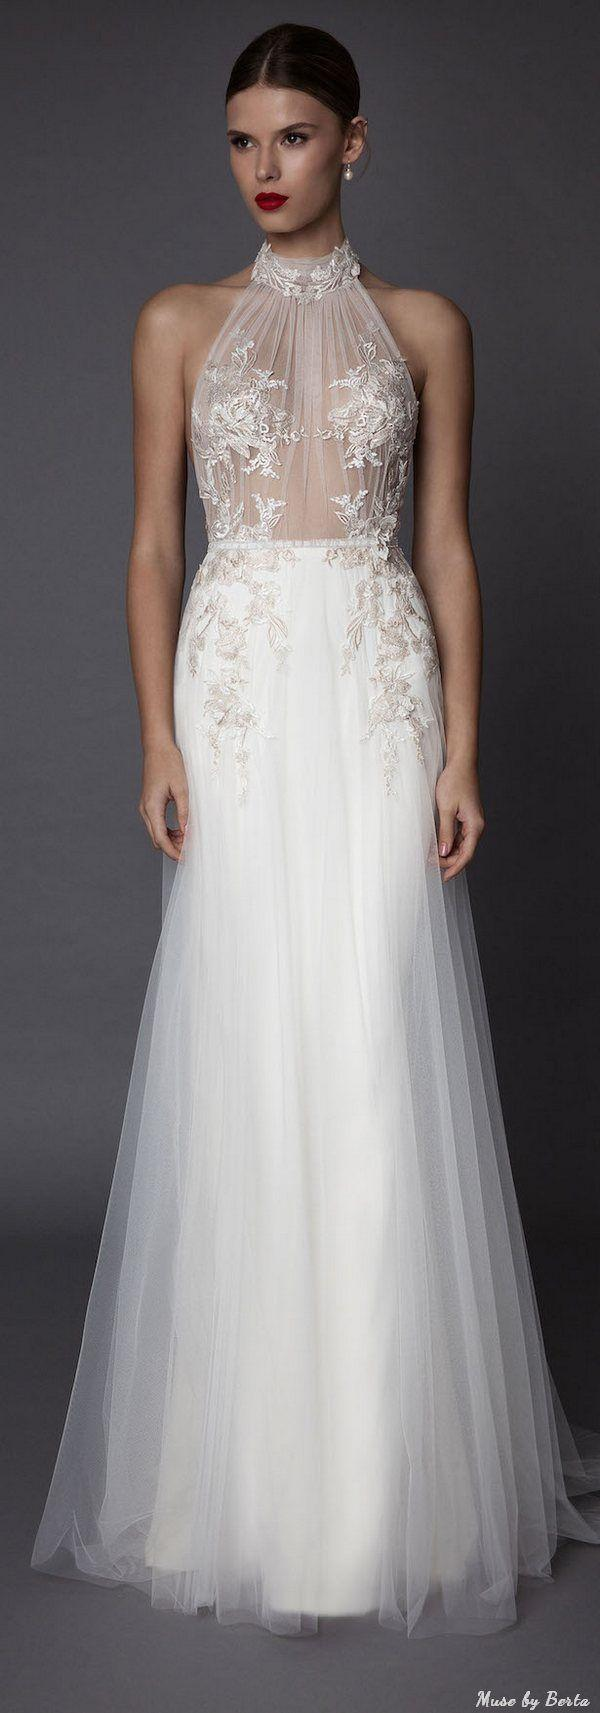 Wedding - Muse By Berta Wedding Dress ARMANDA 2